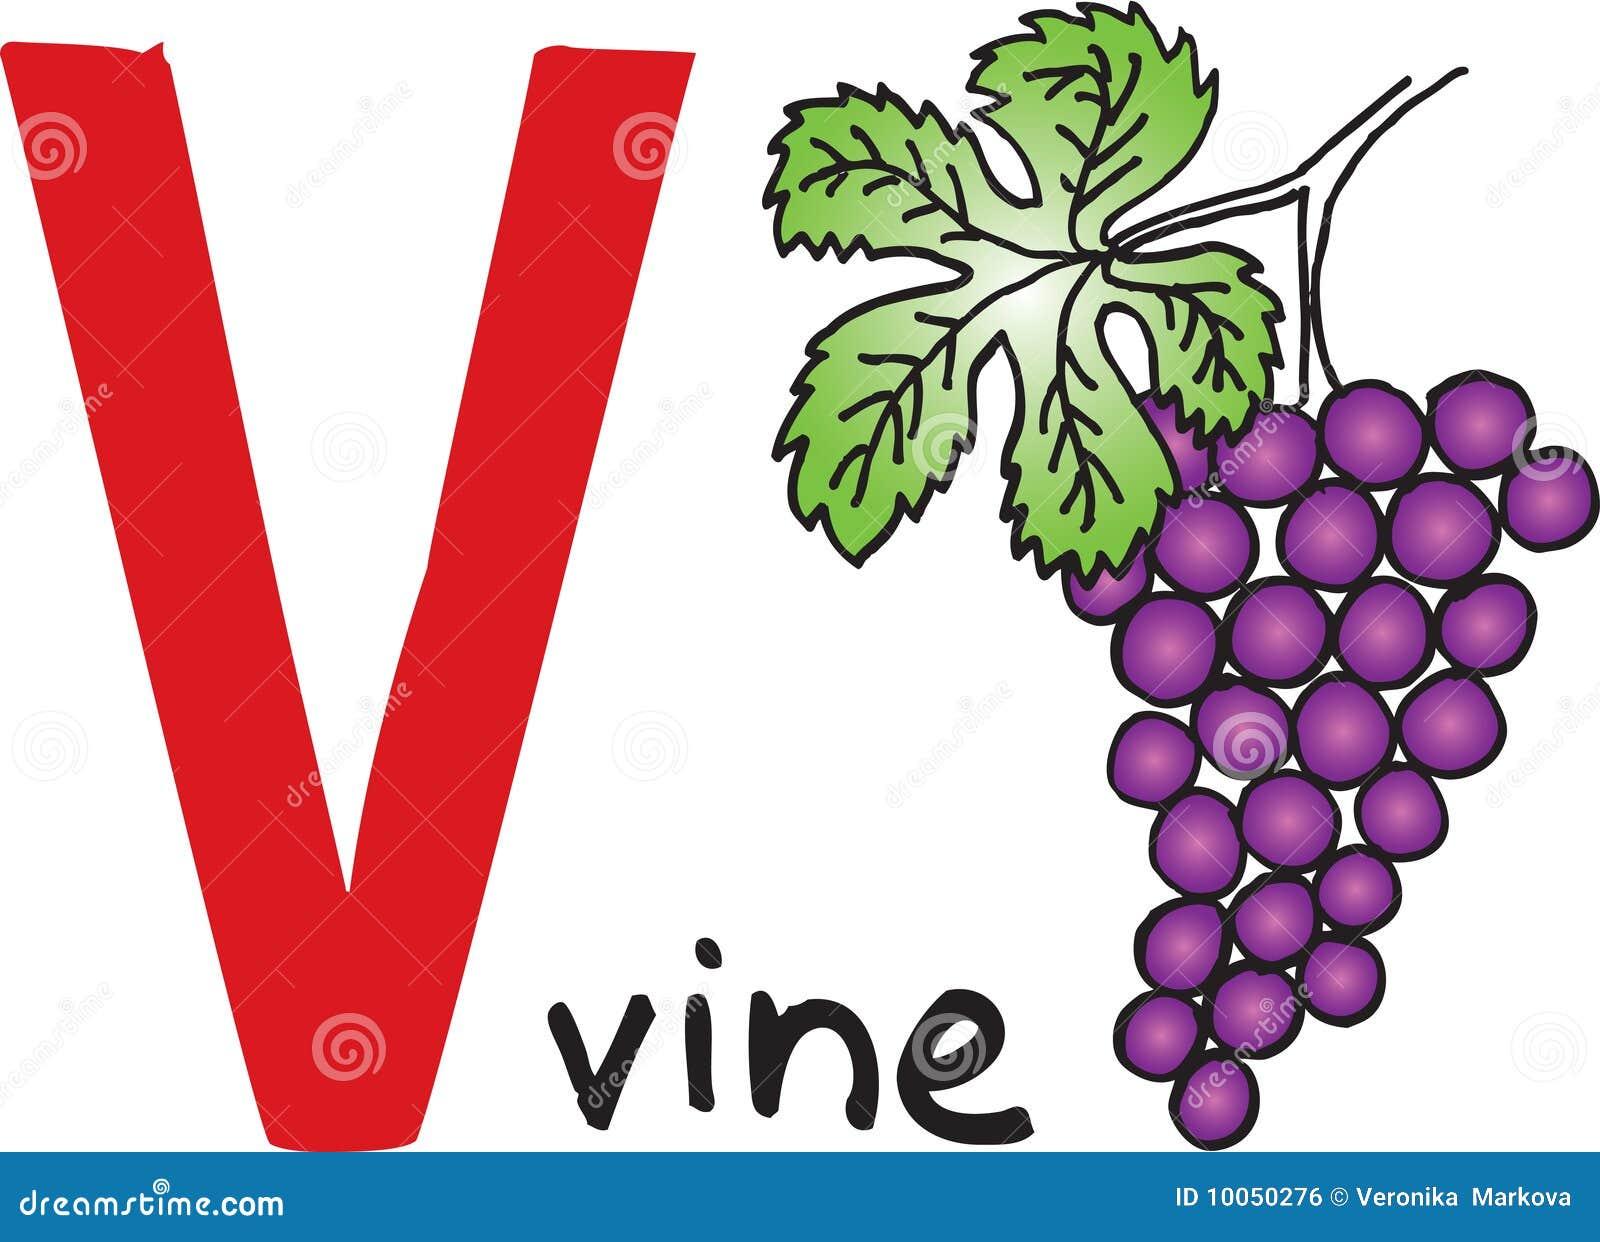 Letter V Vine Royalty Free Stock Image Image 10050276